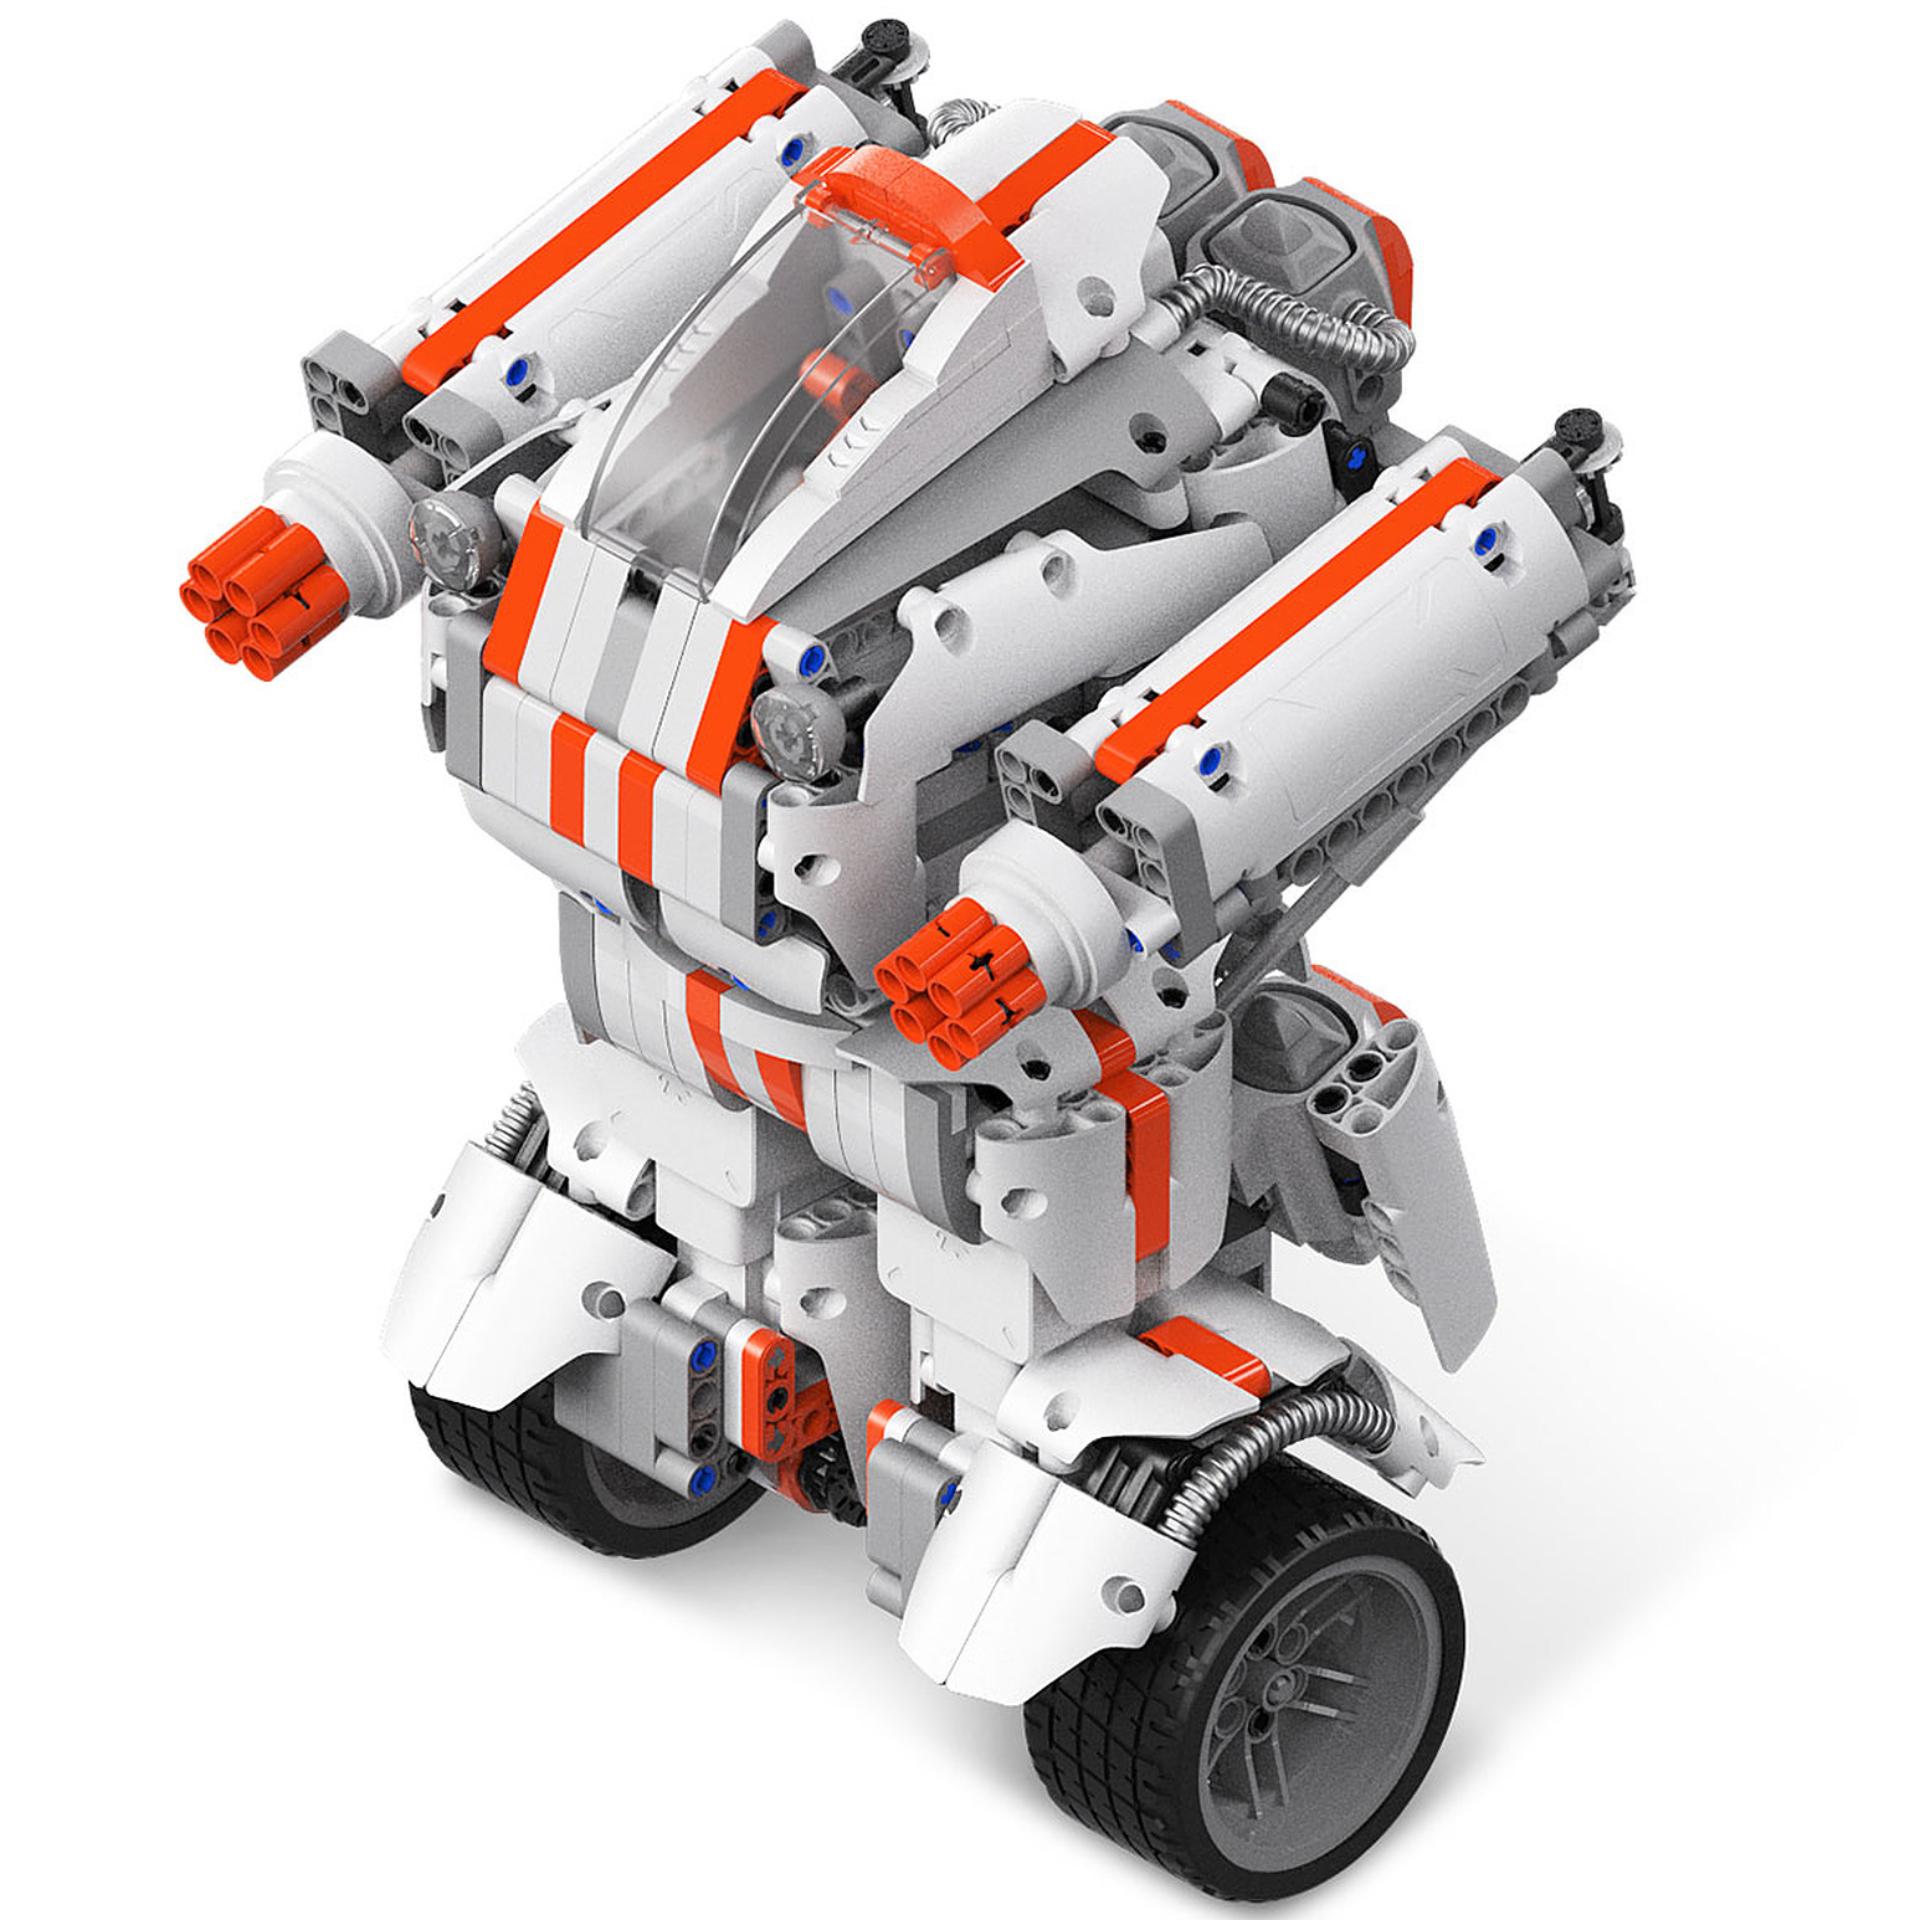 Xiaomi Mi Robot Builder: Klemmbaustein Roboter mit Motor - Versand aus EU (978 Teile, Servo Motor, App Steuerbar, Gyro-Sensor, 12h Akku)